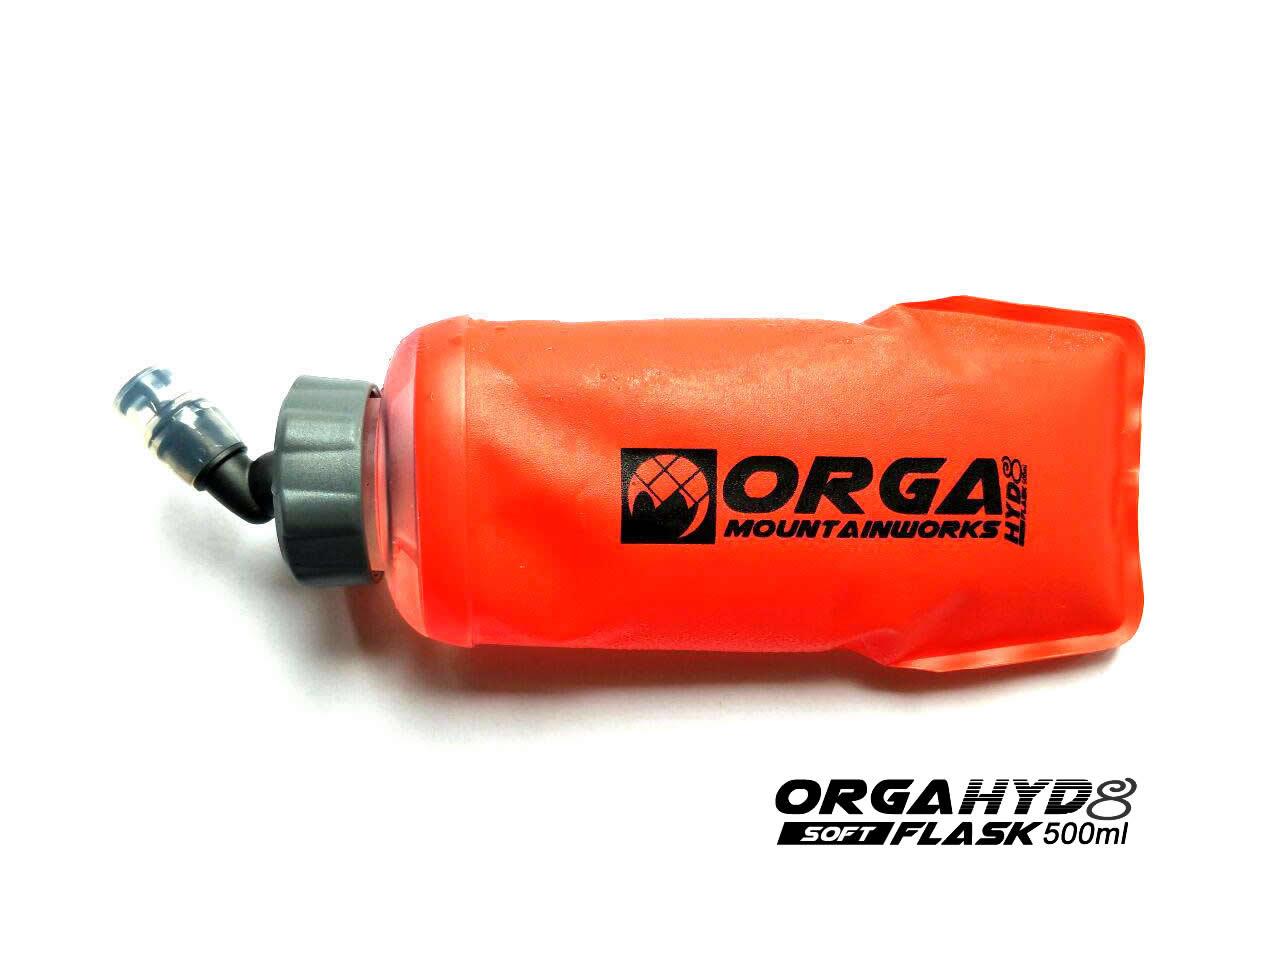 ORGA Hyd8 Soft Flask Combo 11